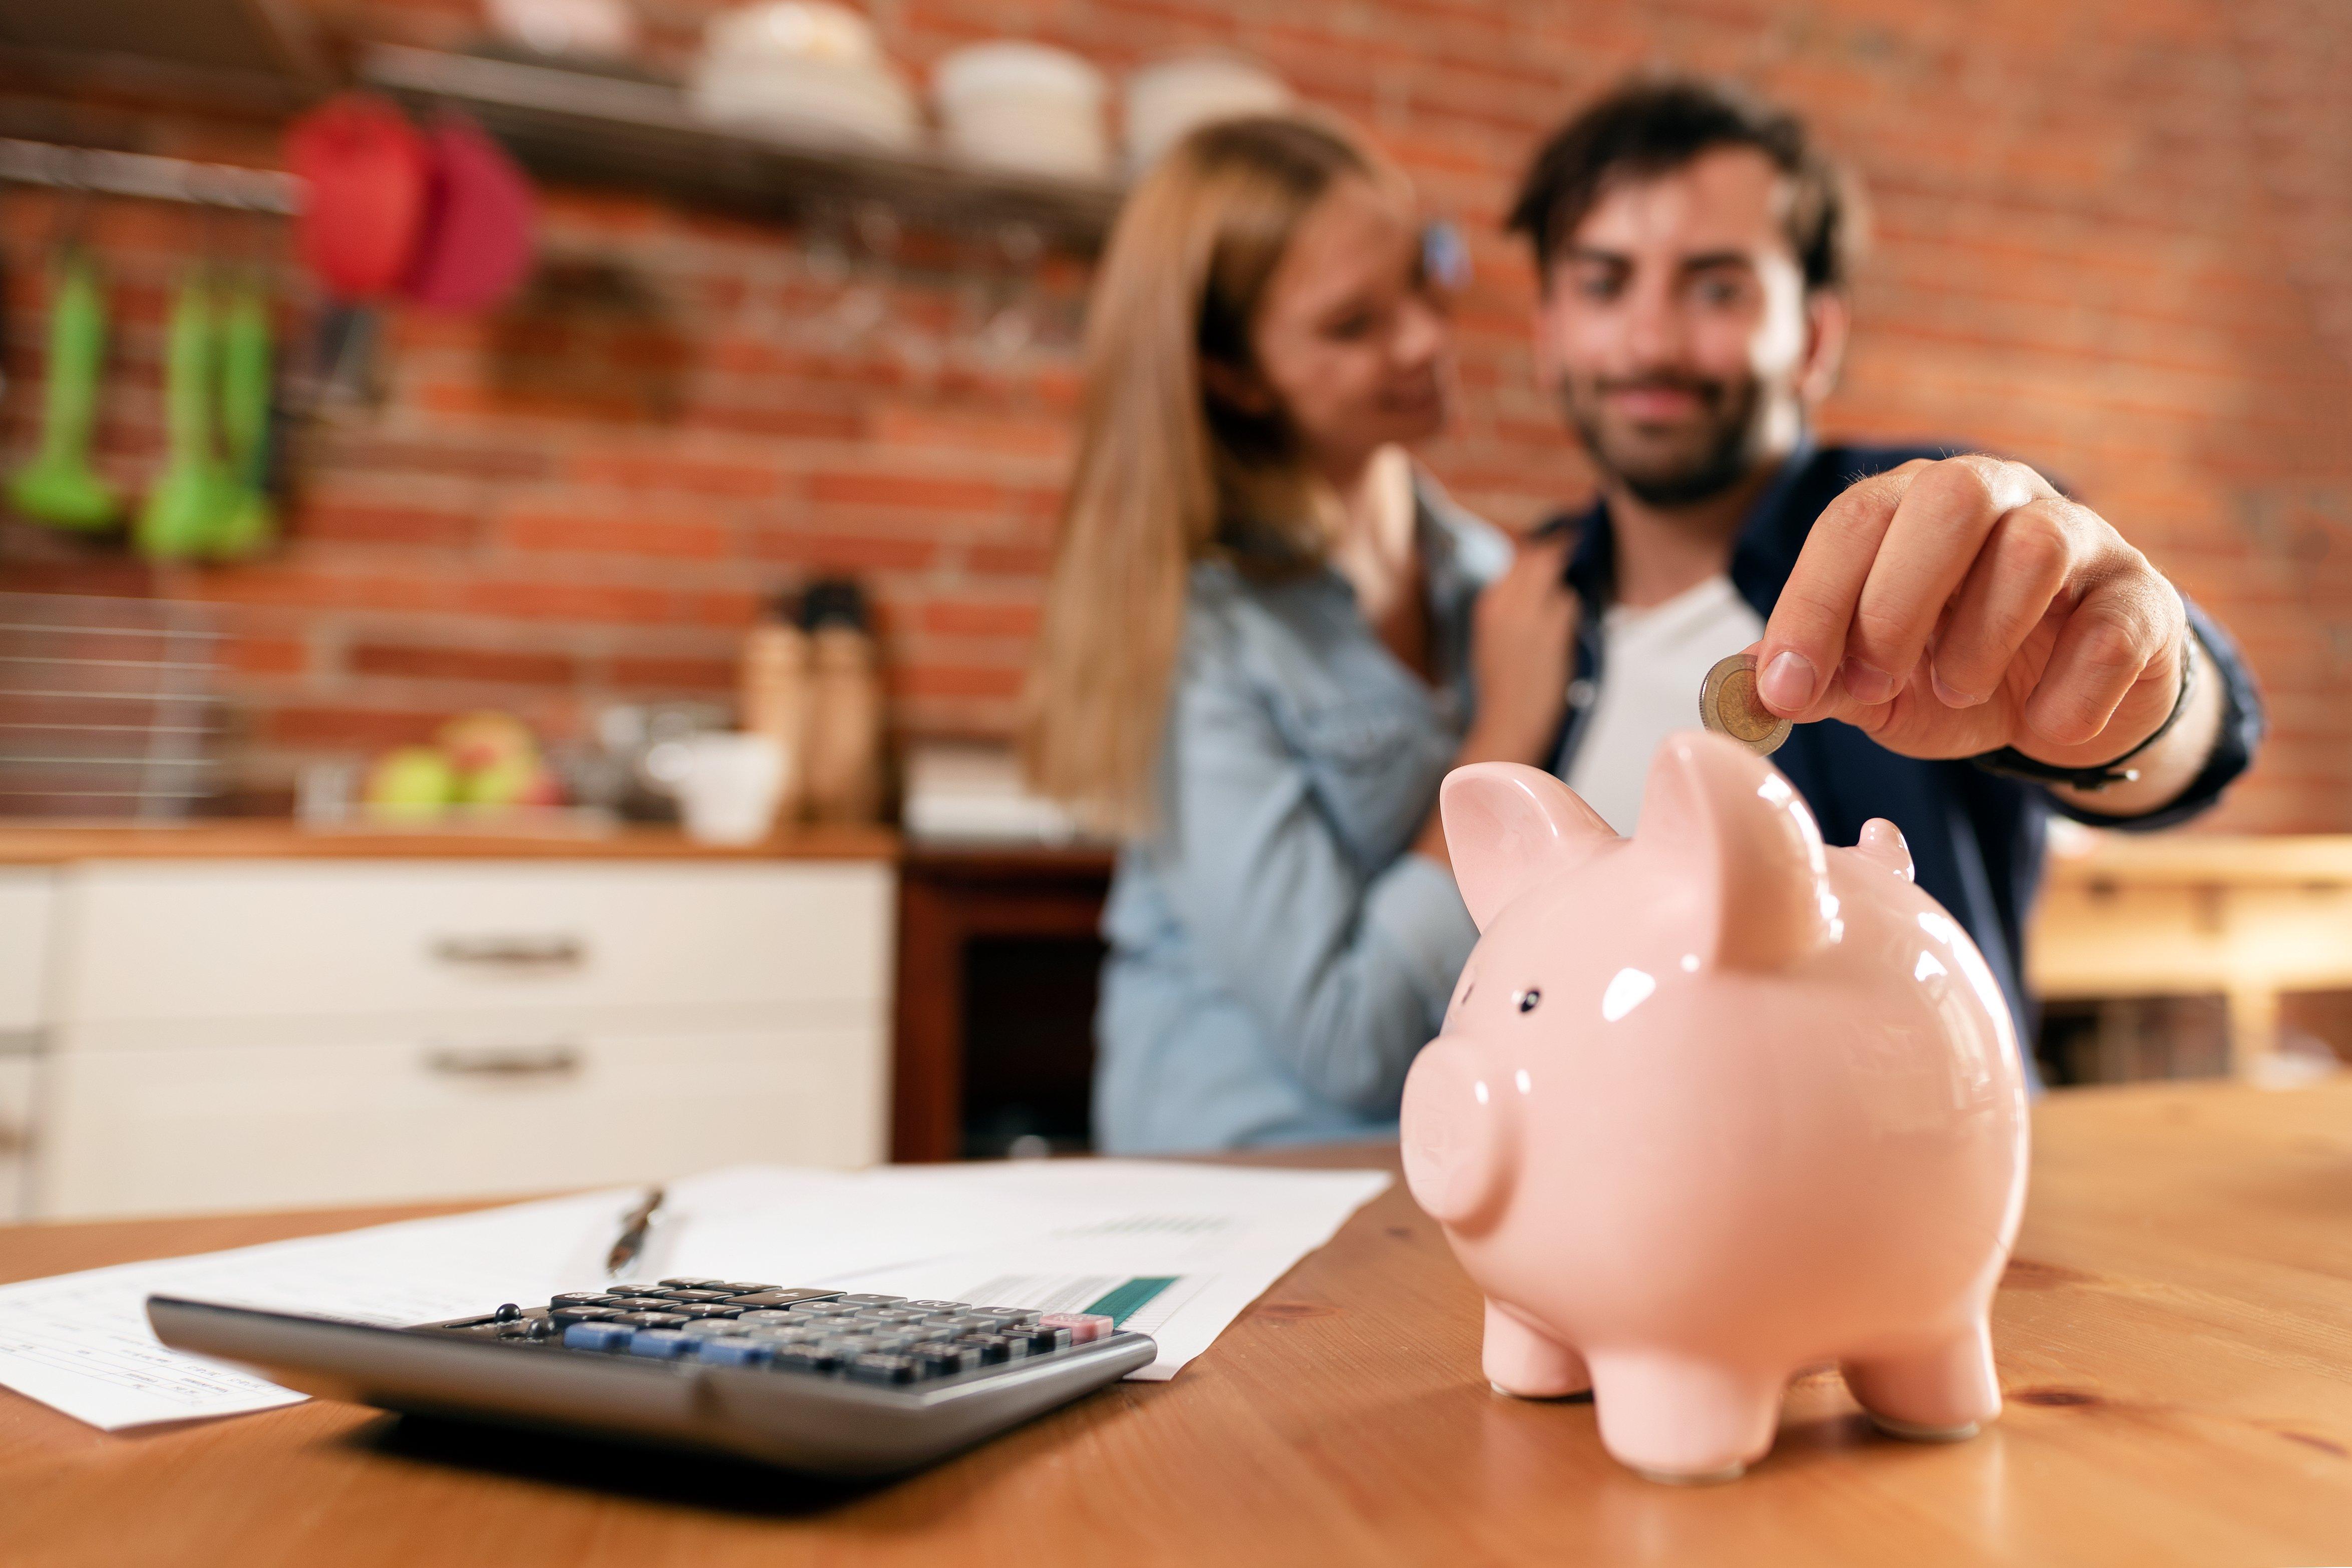 como economizar na faculdade?